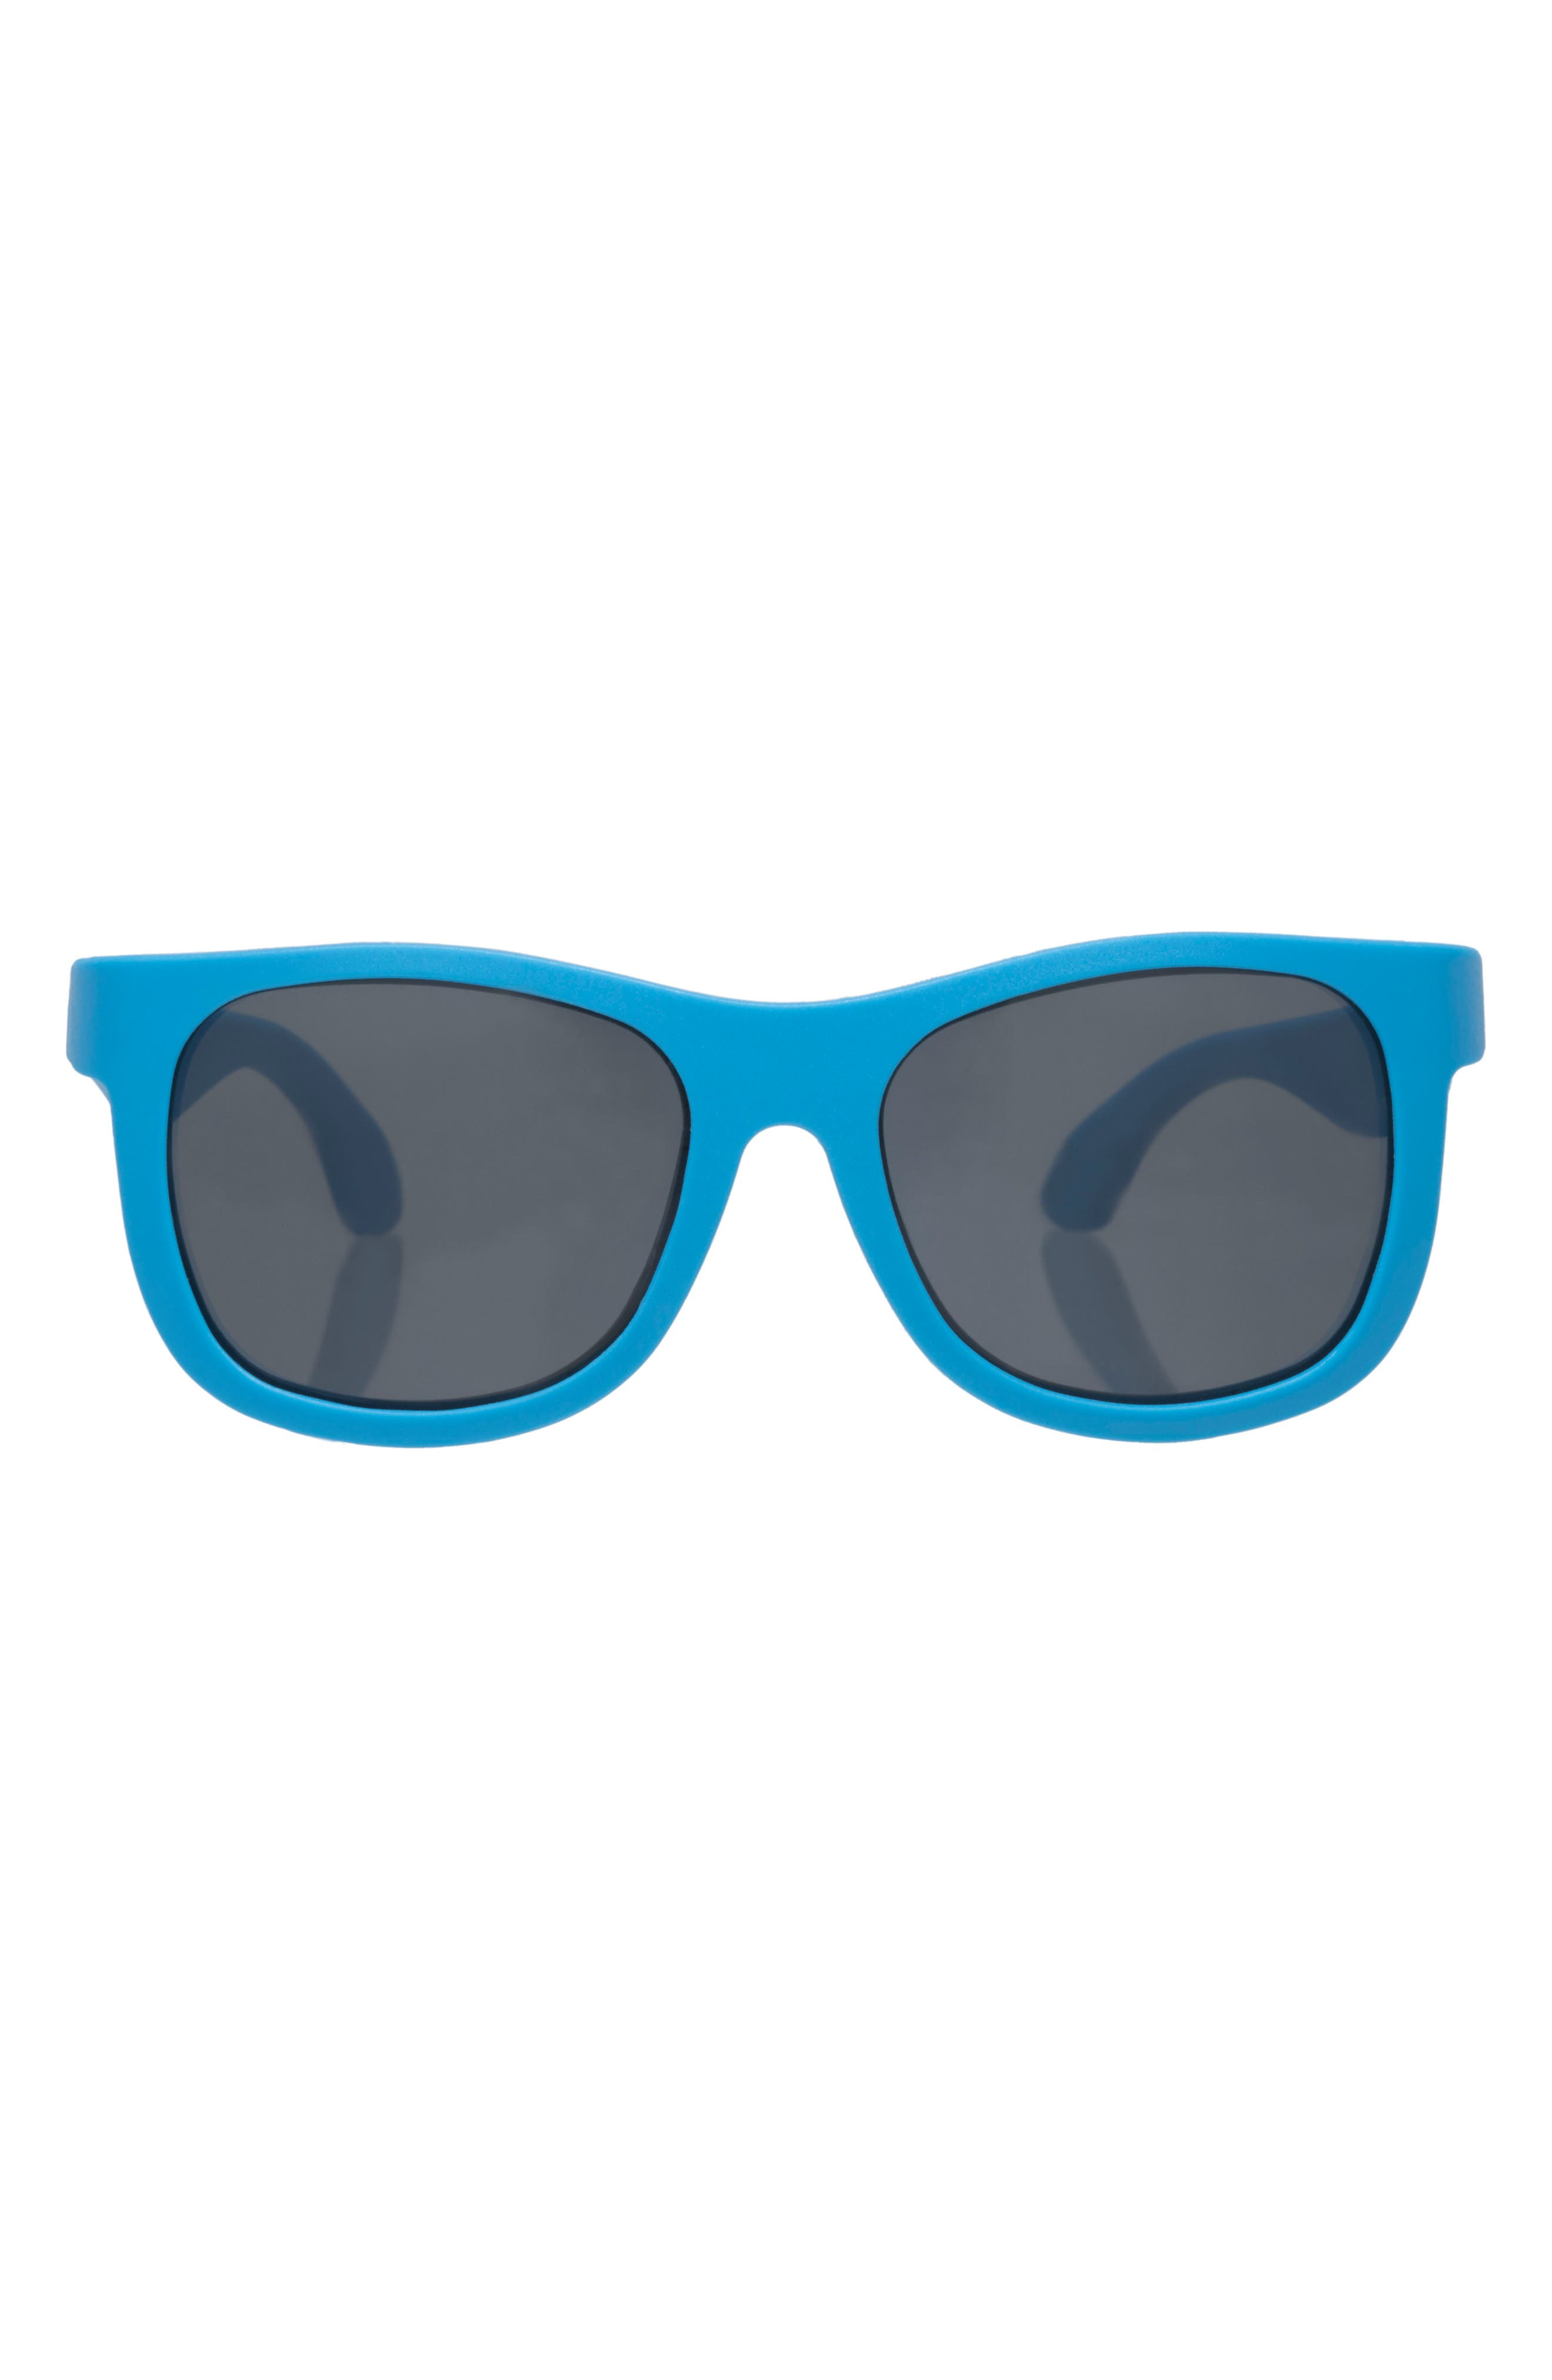 Original Navigators Sunglasses,                             Main thumbnail 1, color,                             Blue Crush